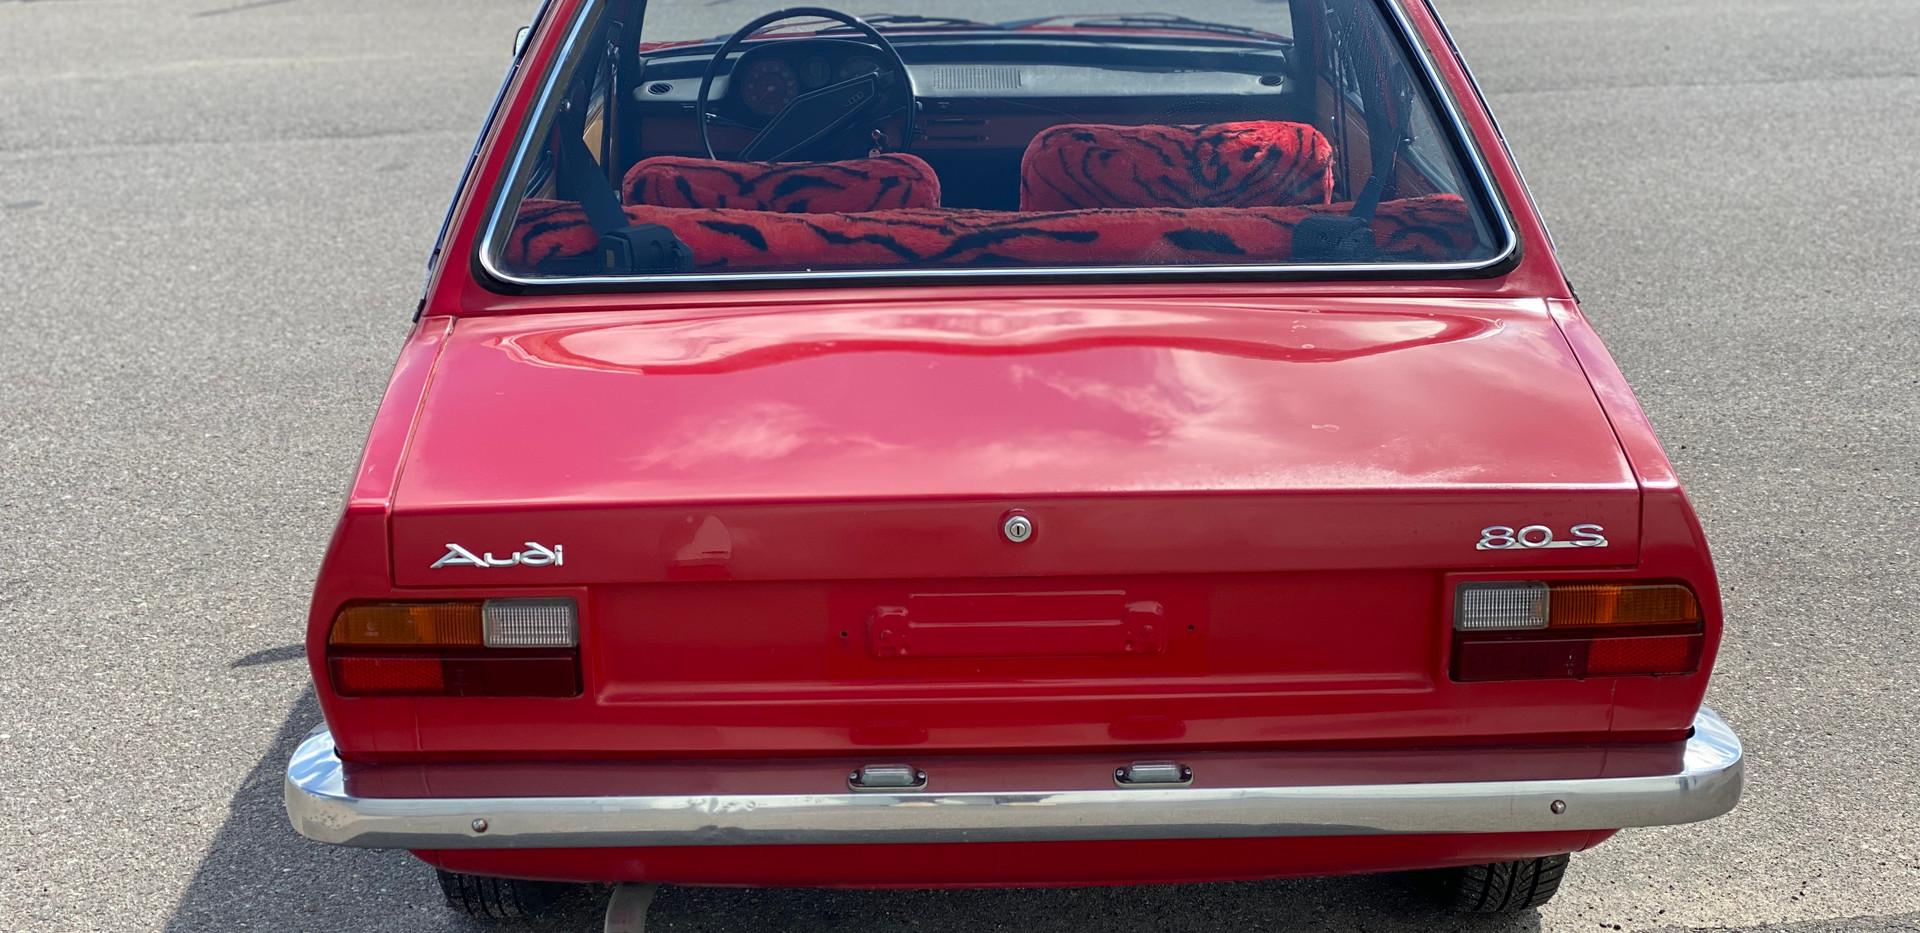 Audi 80 1973